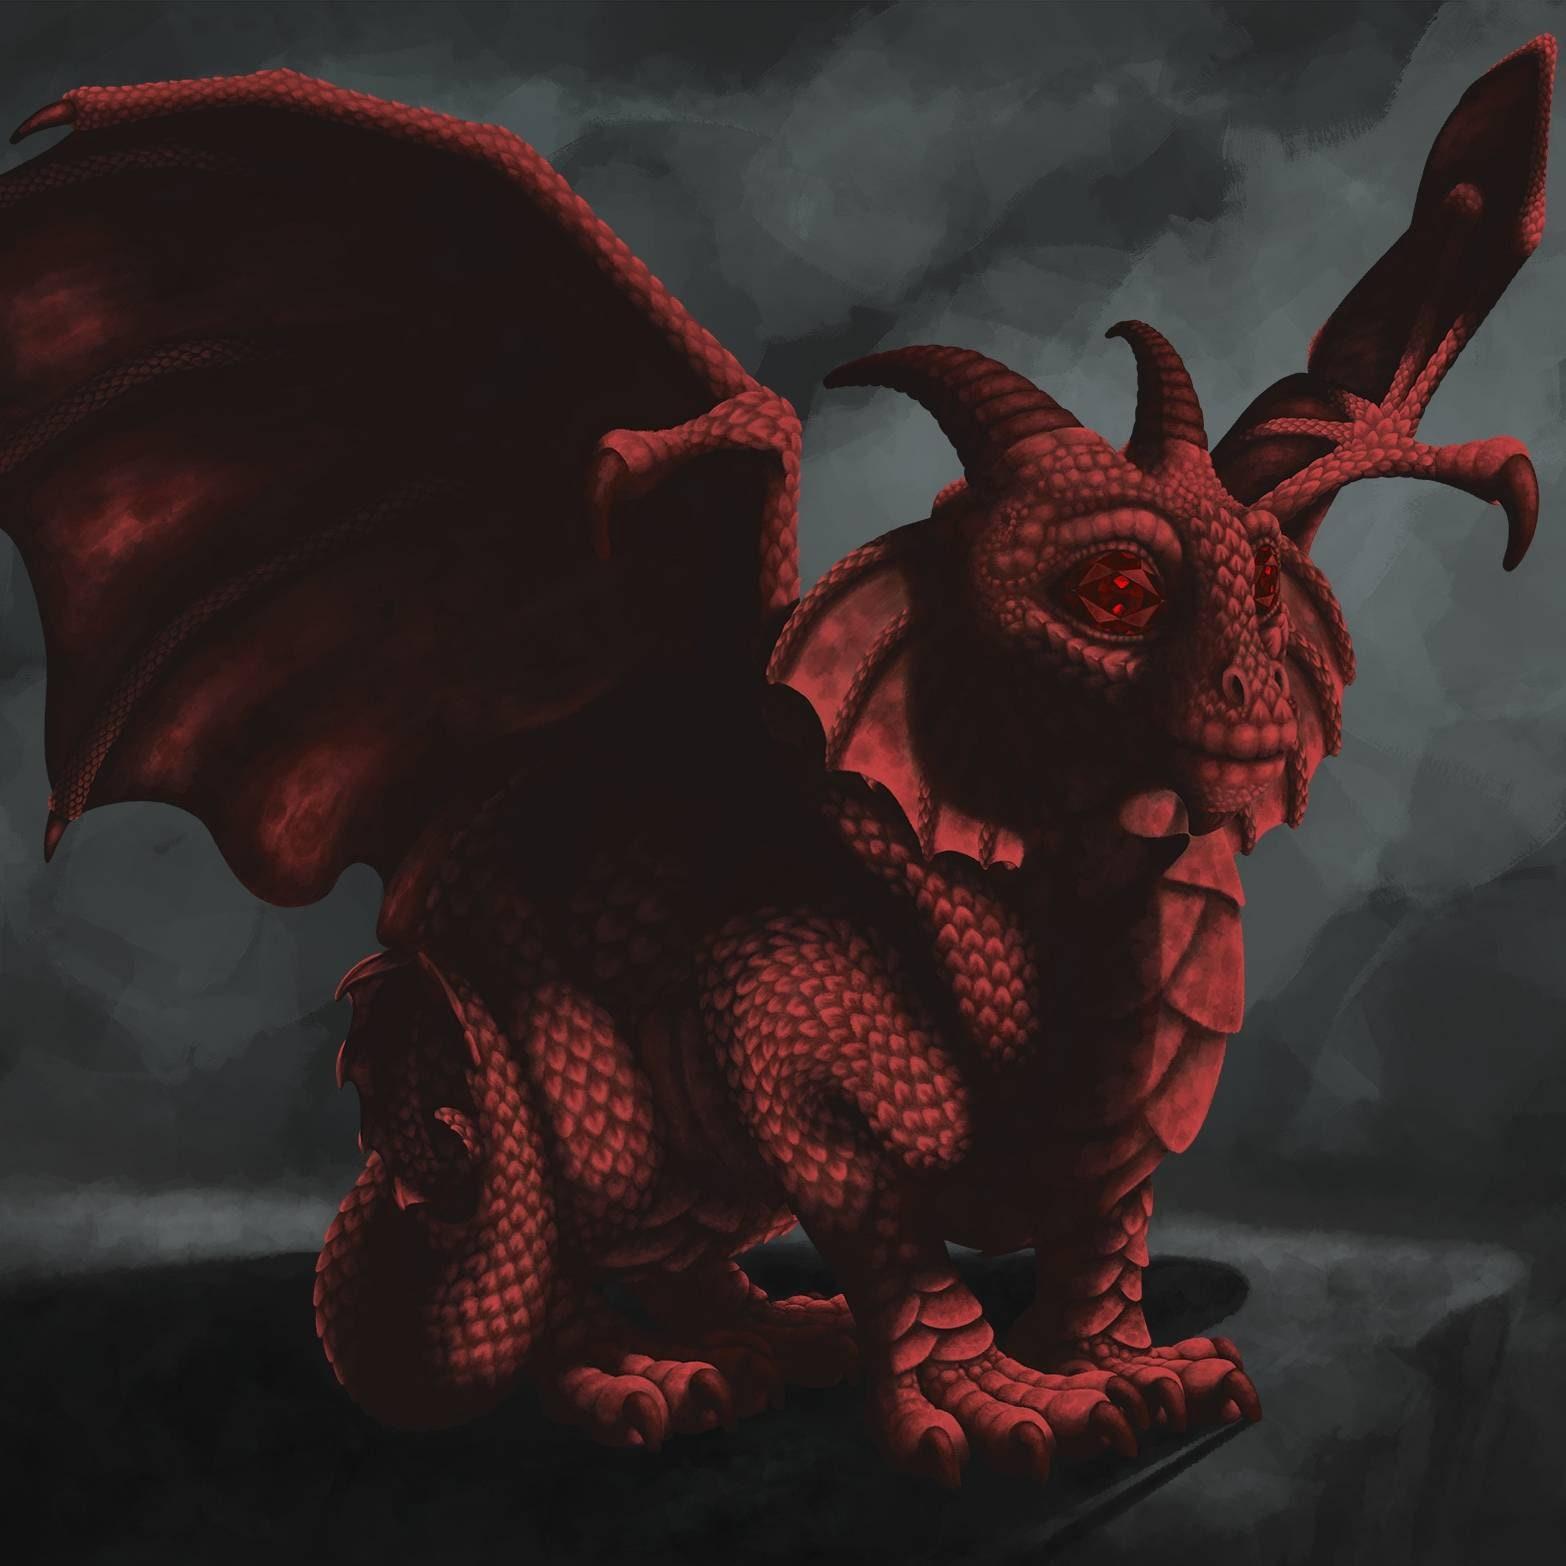 Close Encounters Red Dragon 3 11x11 Art Print